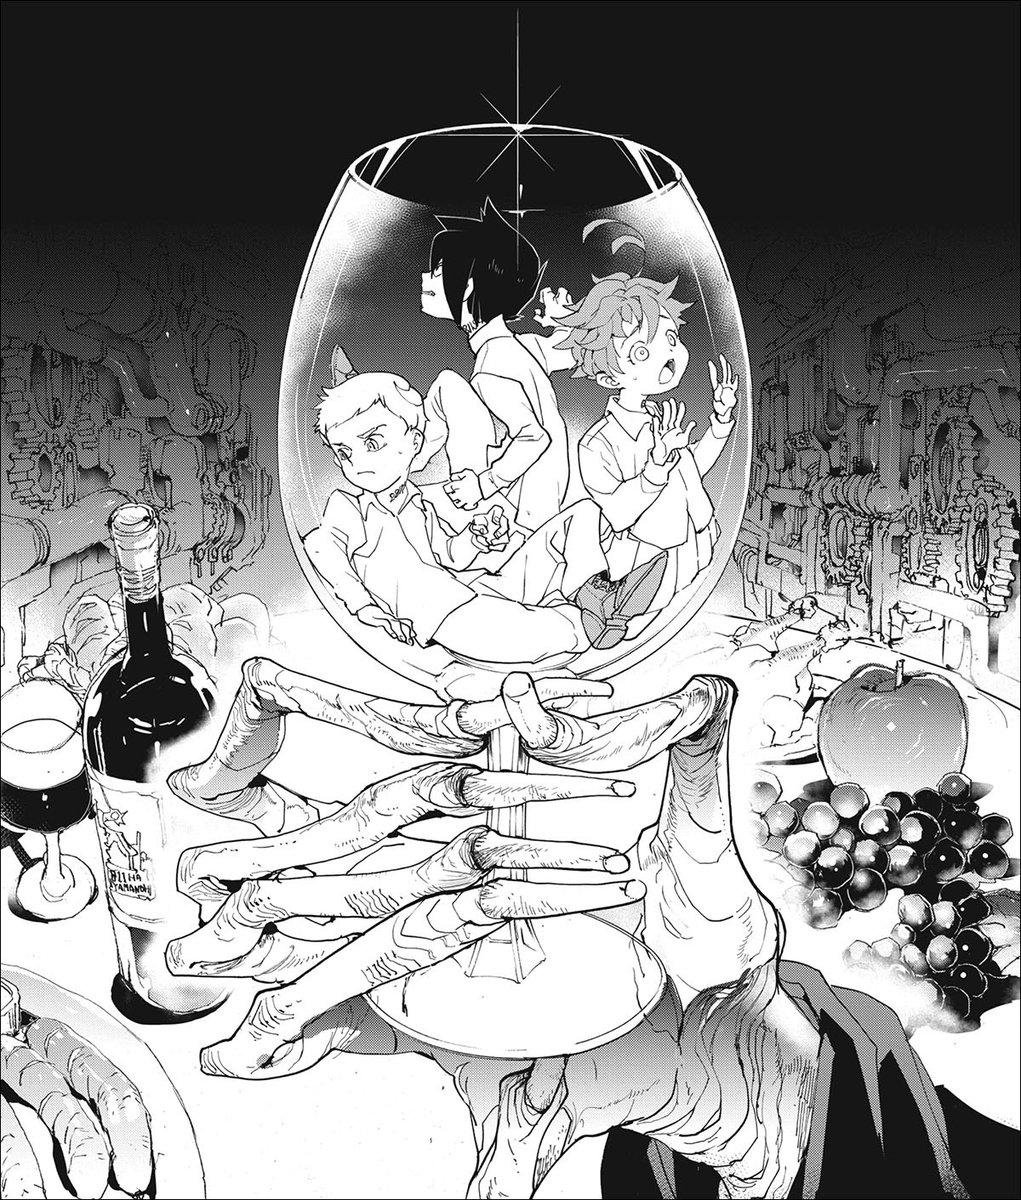 "Shonen Jump on Twitter: ""Is wine the official drink of villains? Kinda  seems that way. Doesn't get much more villainous than a glass full of  hapless children. #NationalDrinkWineDay #ThePromisedNeverland…  https://t.co/aySqUEc7jd"""